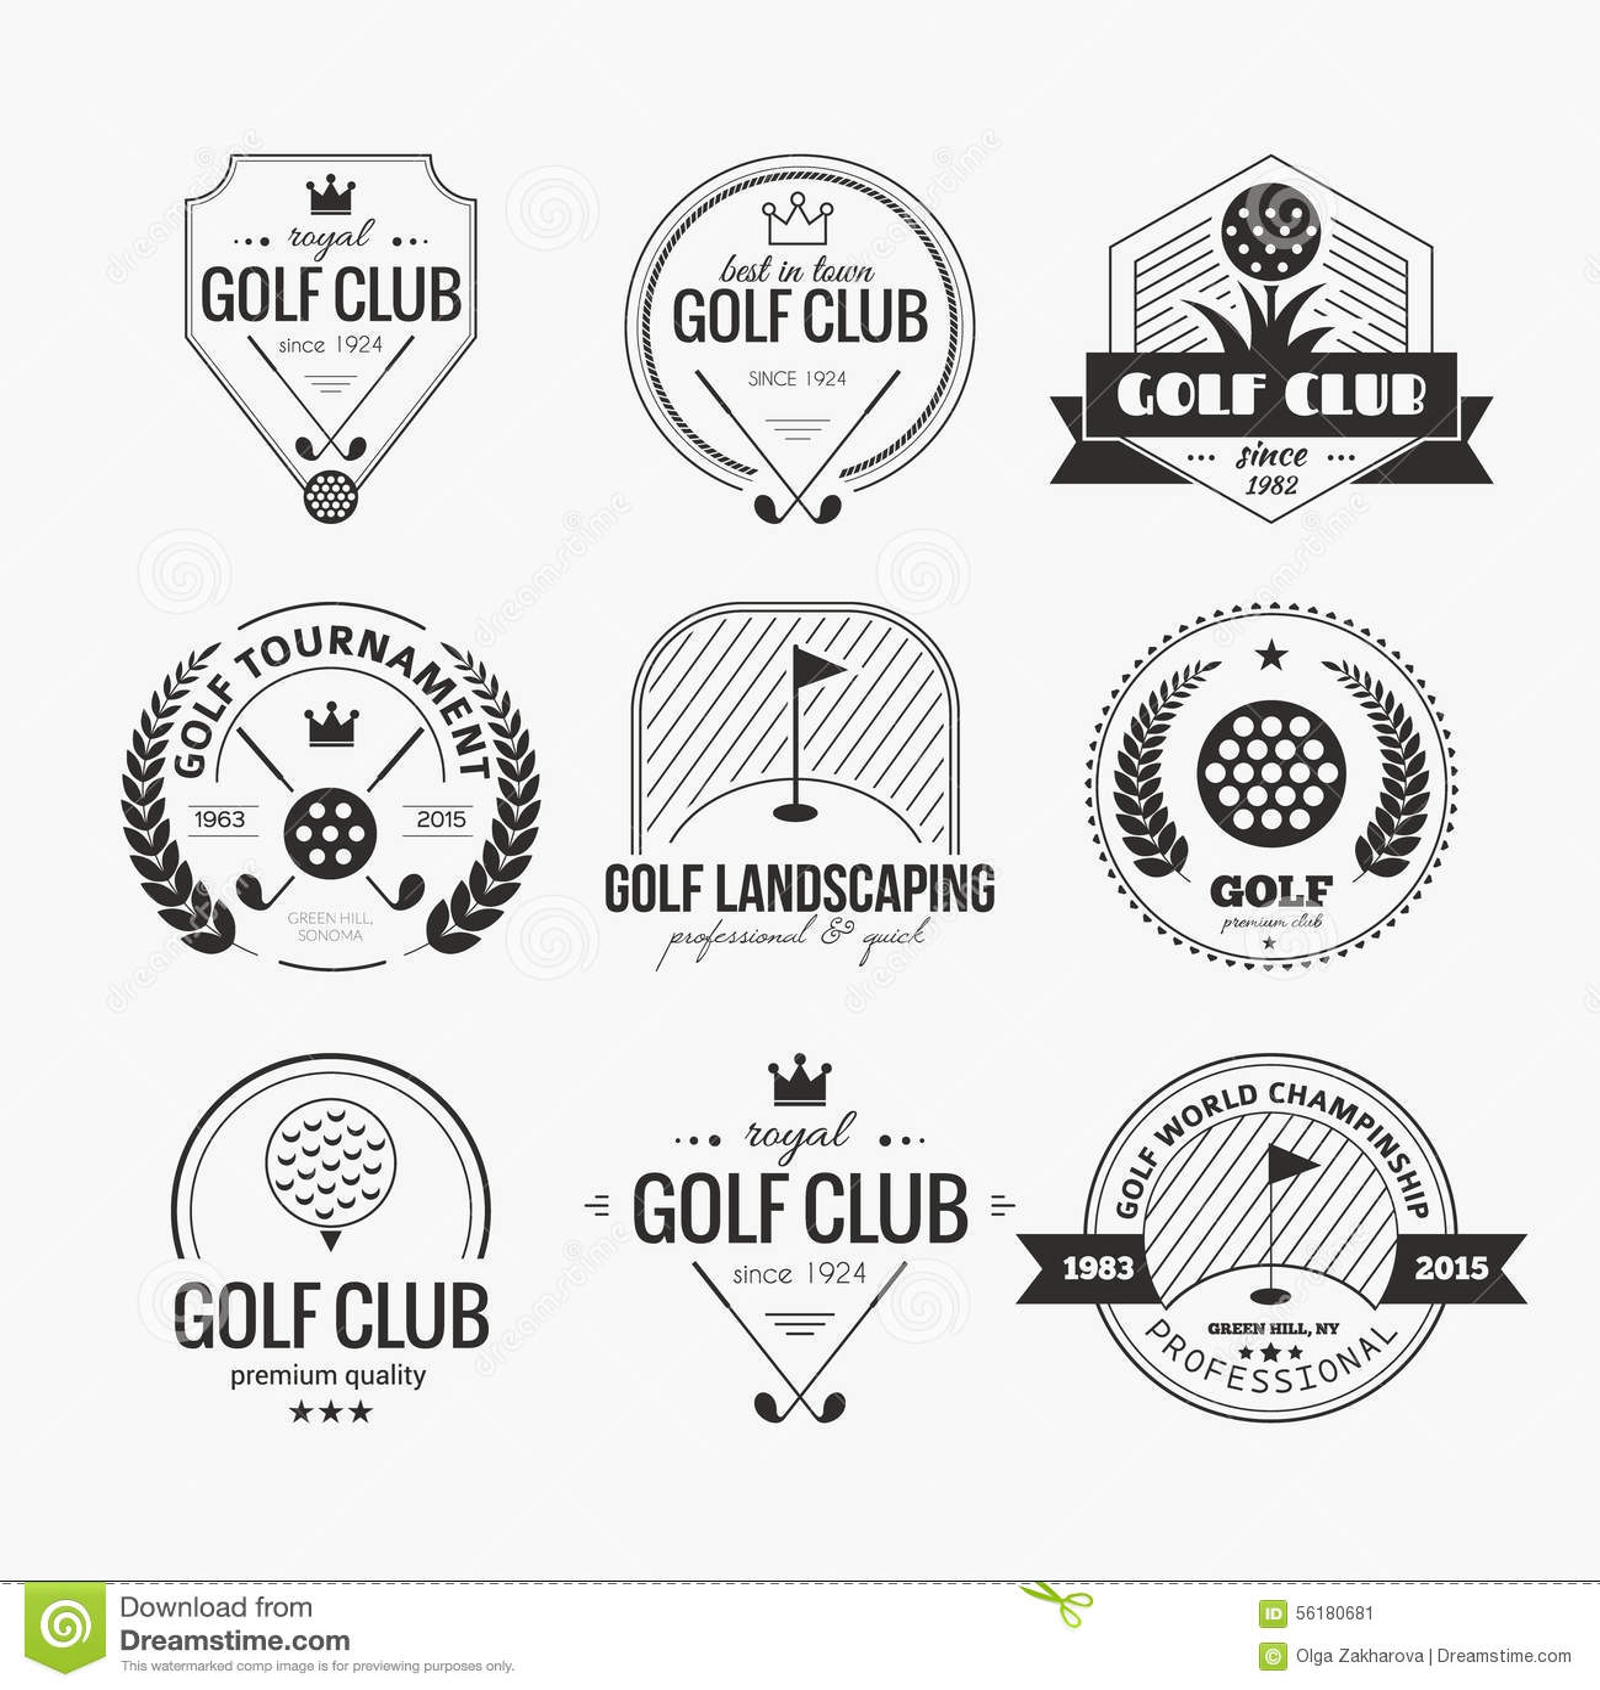 Golf Club Logo stock vector. Illustration of design, retro